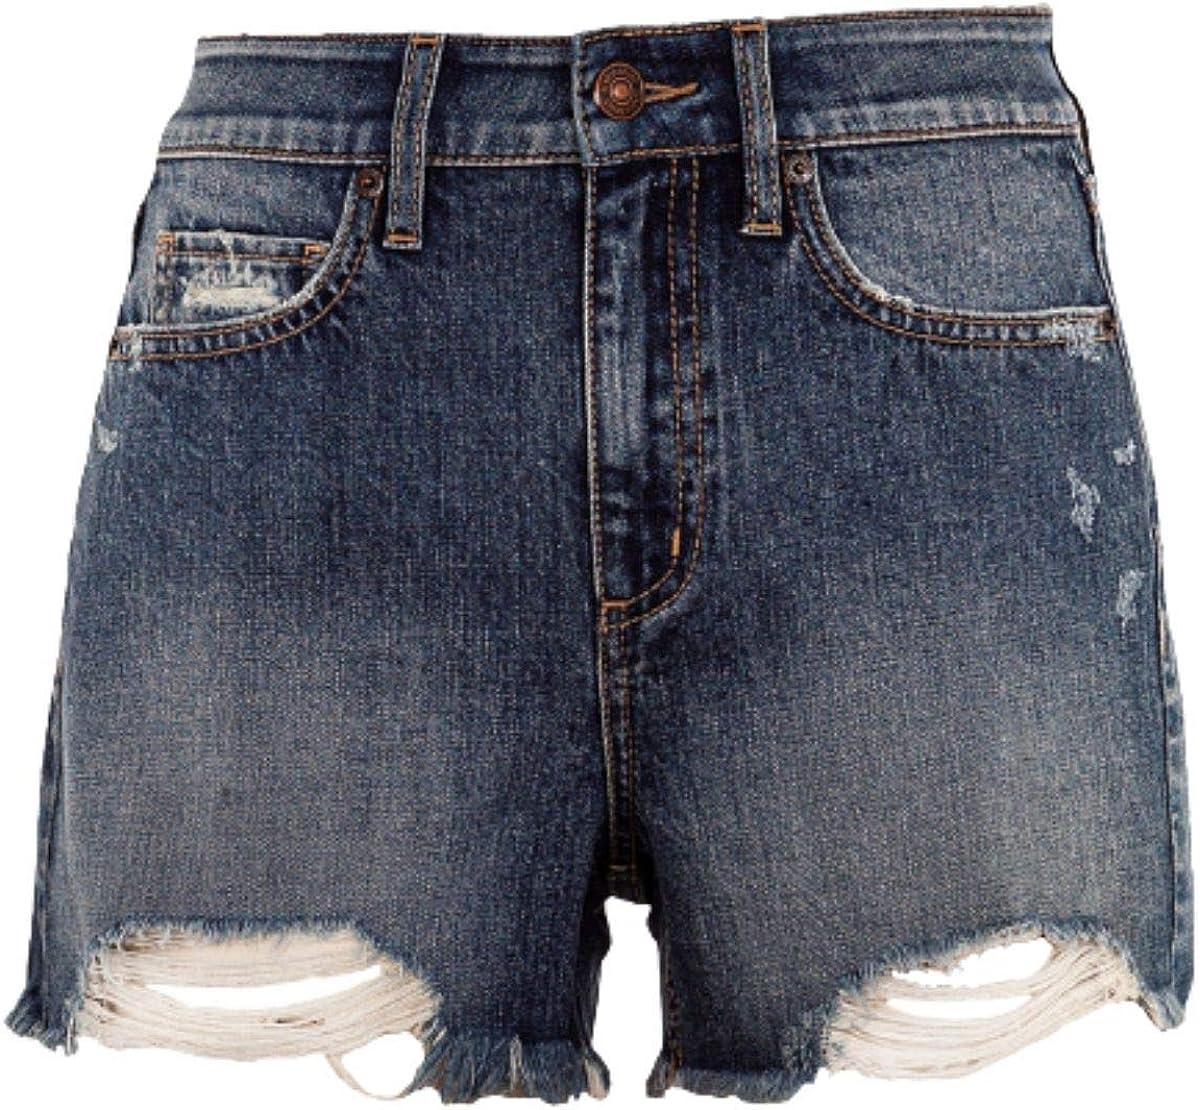 Rewash Juniors' Distressed High Rise Denim Shorts Size 7- Dark Blue